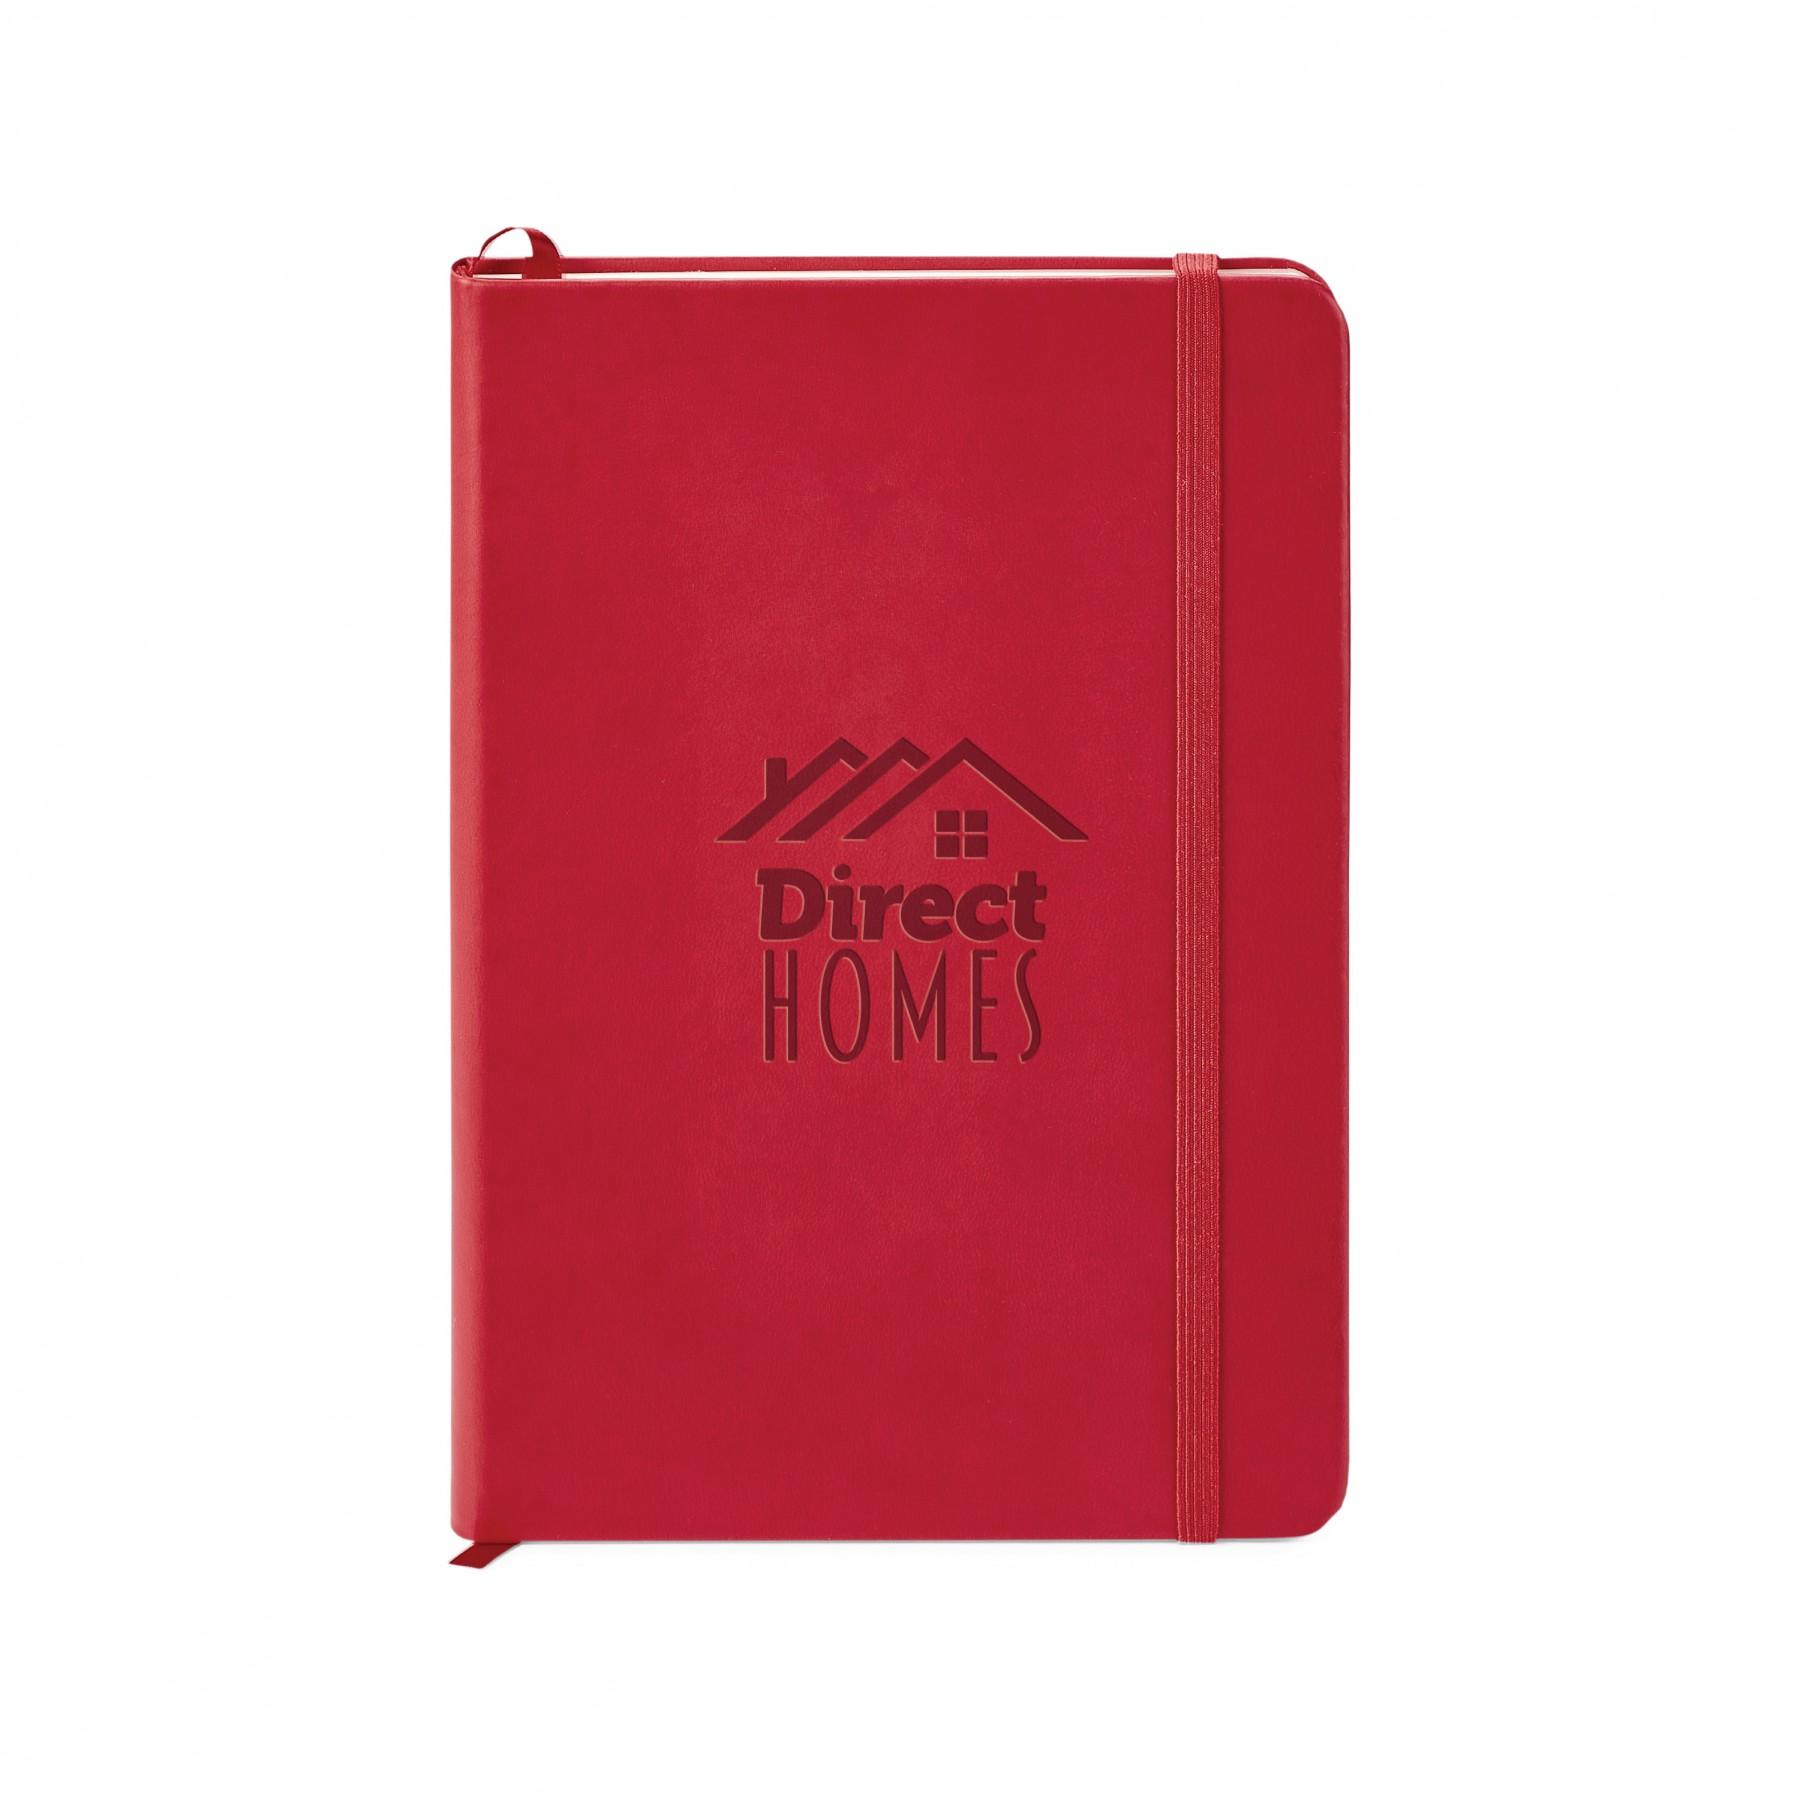 Donald Hard Cover Journal - Debossed Imprint (ST4177)